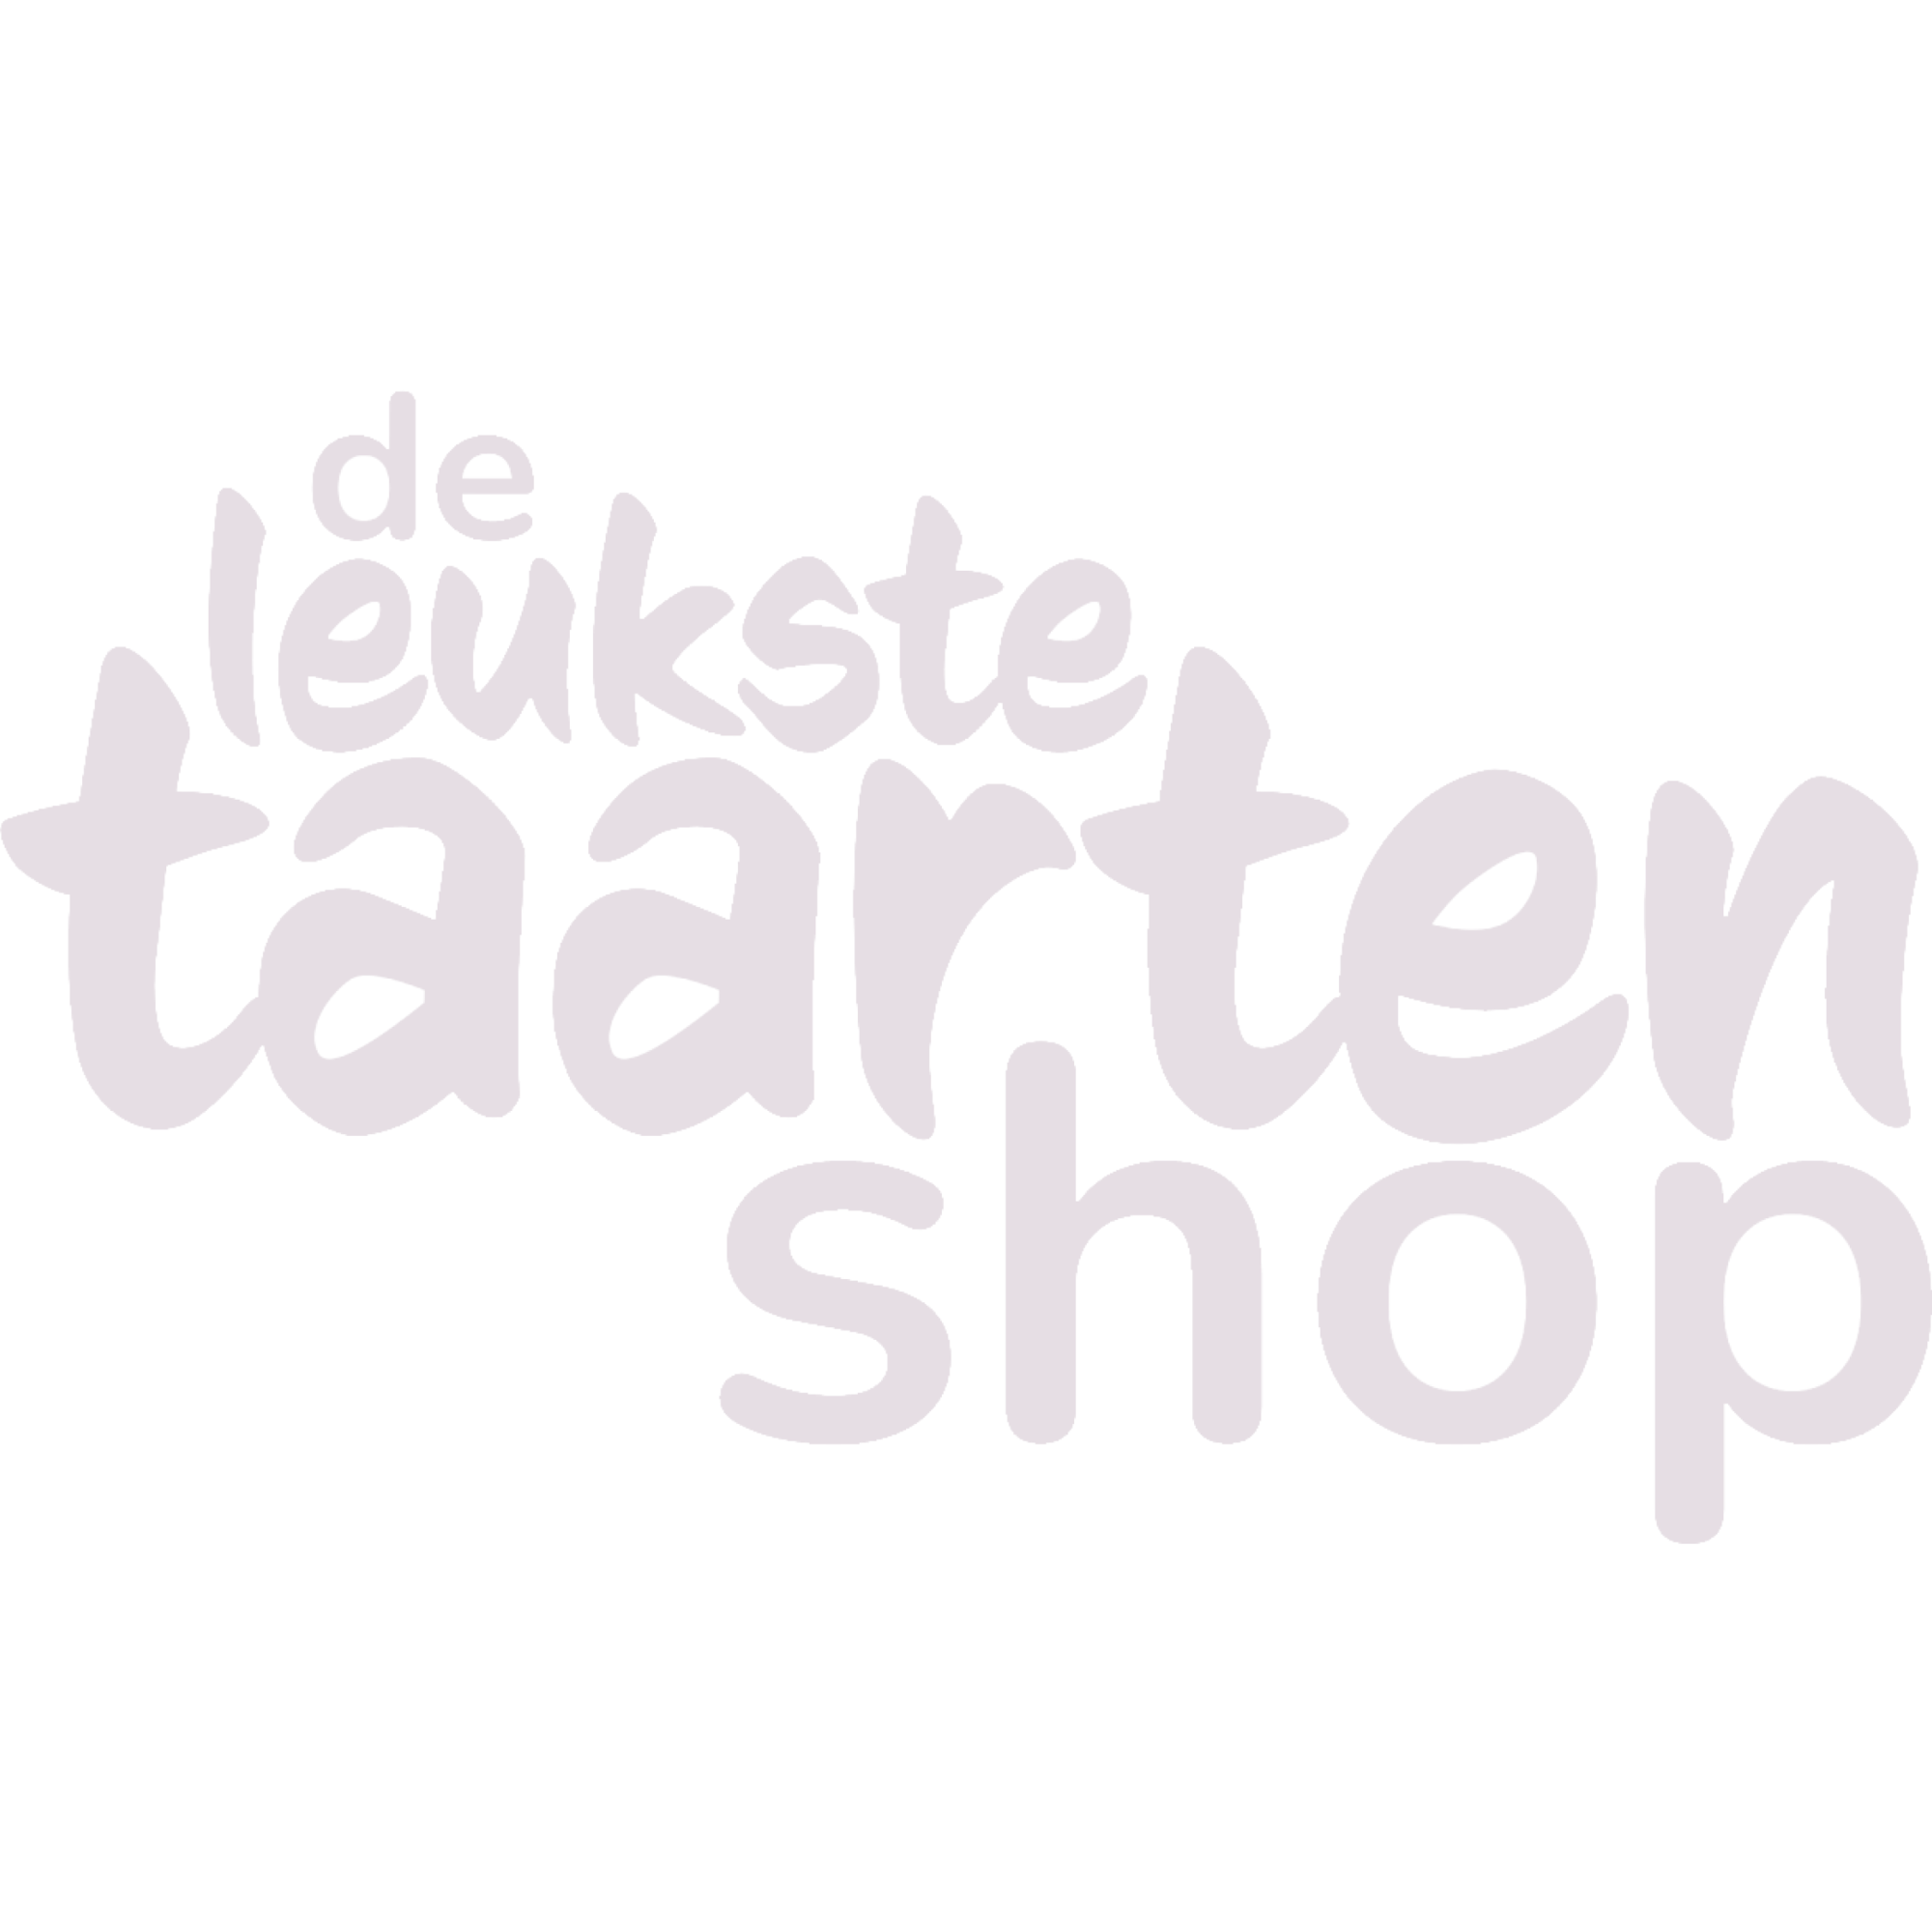 http://www.deleukstetaartenshop.nl/media/catalog/product/cache/1/image/304x304/9df78eab33525d08d6e5fb8d27136e95/L/0/L0220_25.jpg